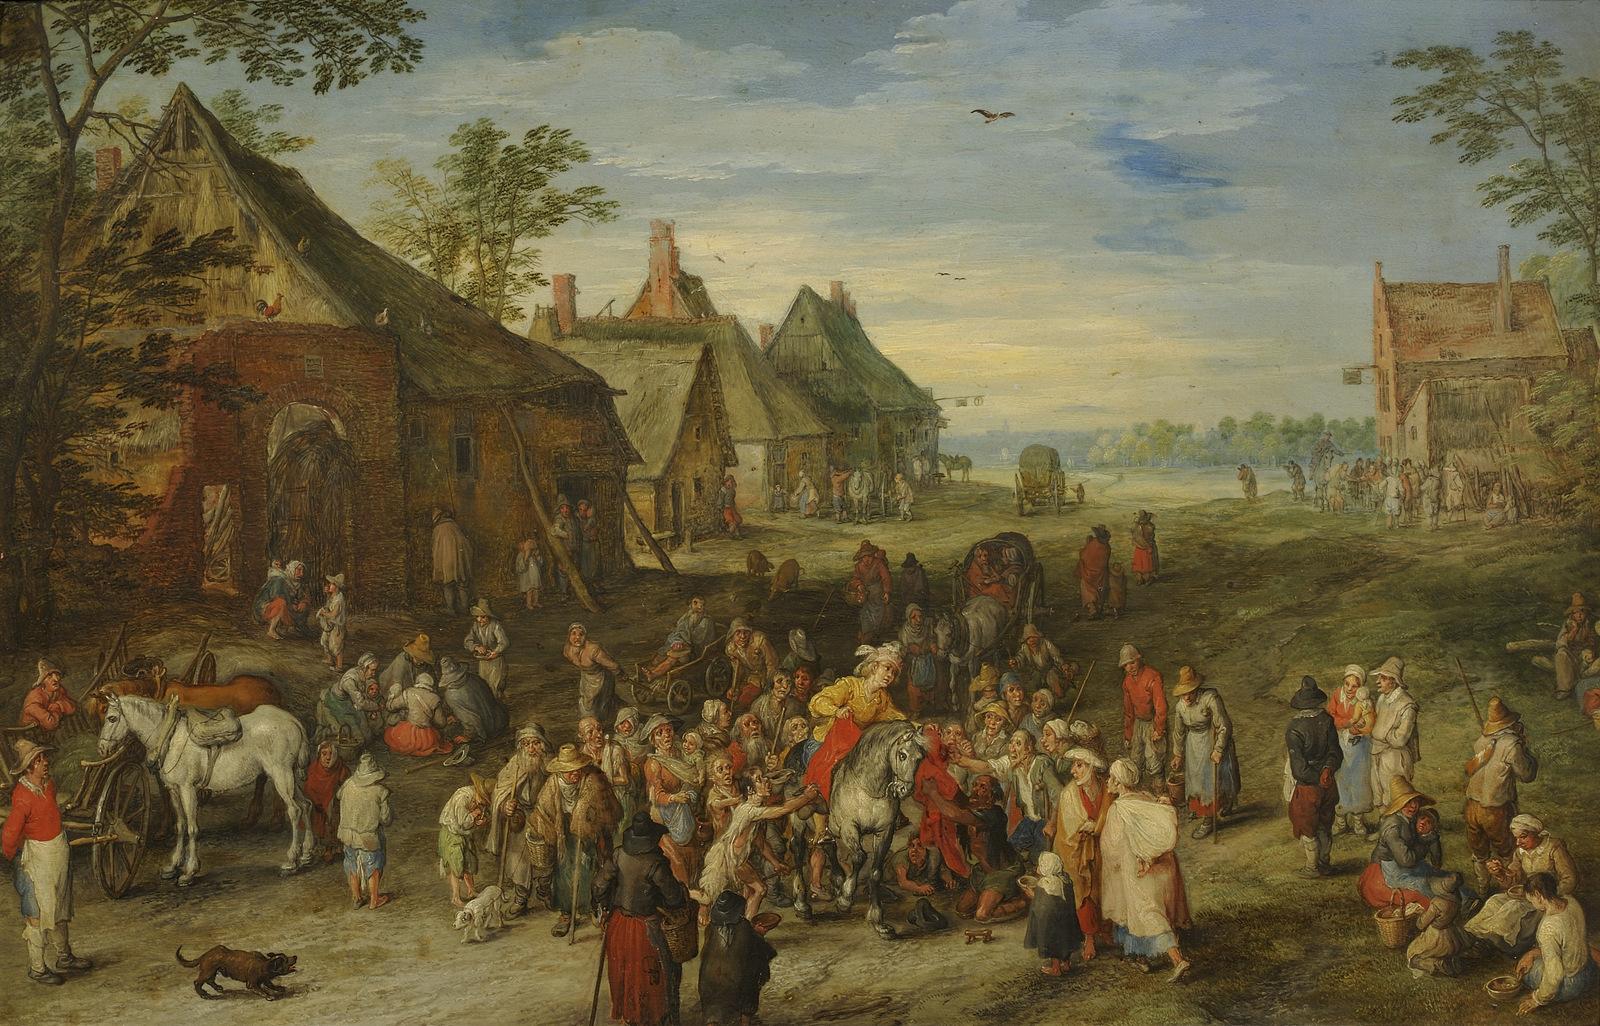 A Village Scene with St. Martin Dividing his Cloak, Jan Brueghel the Elder, 1611